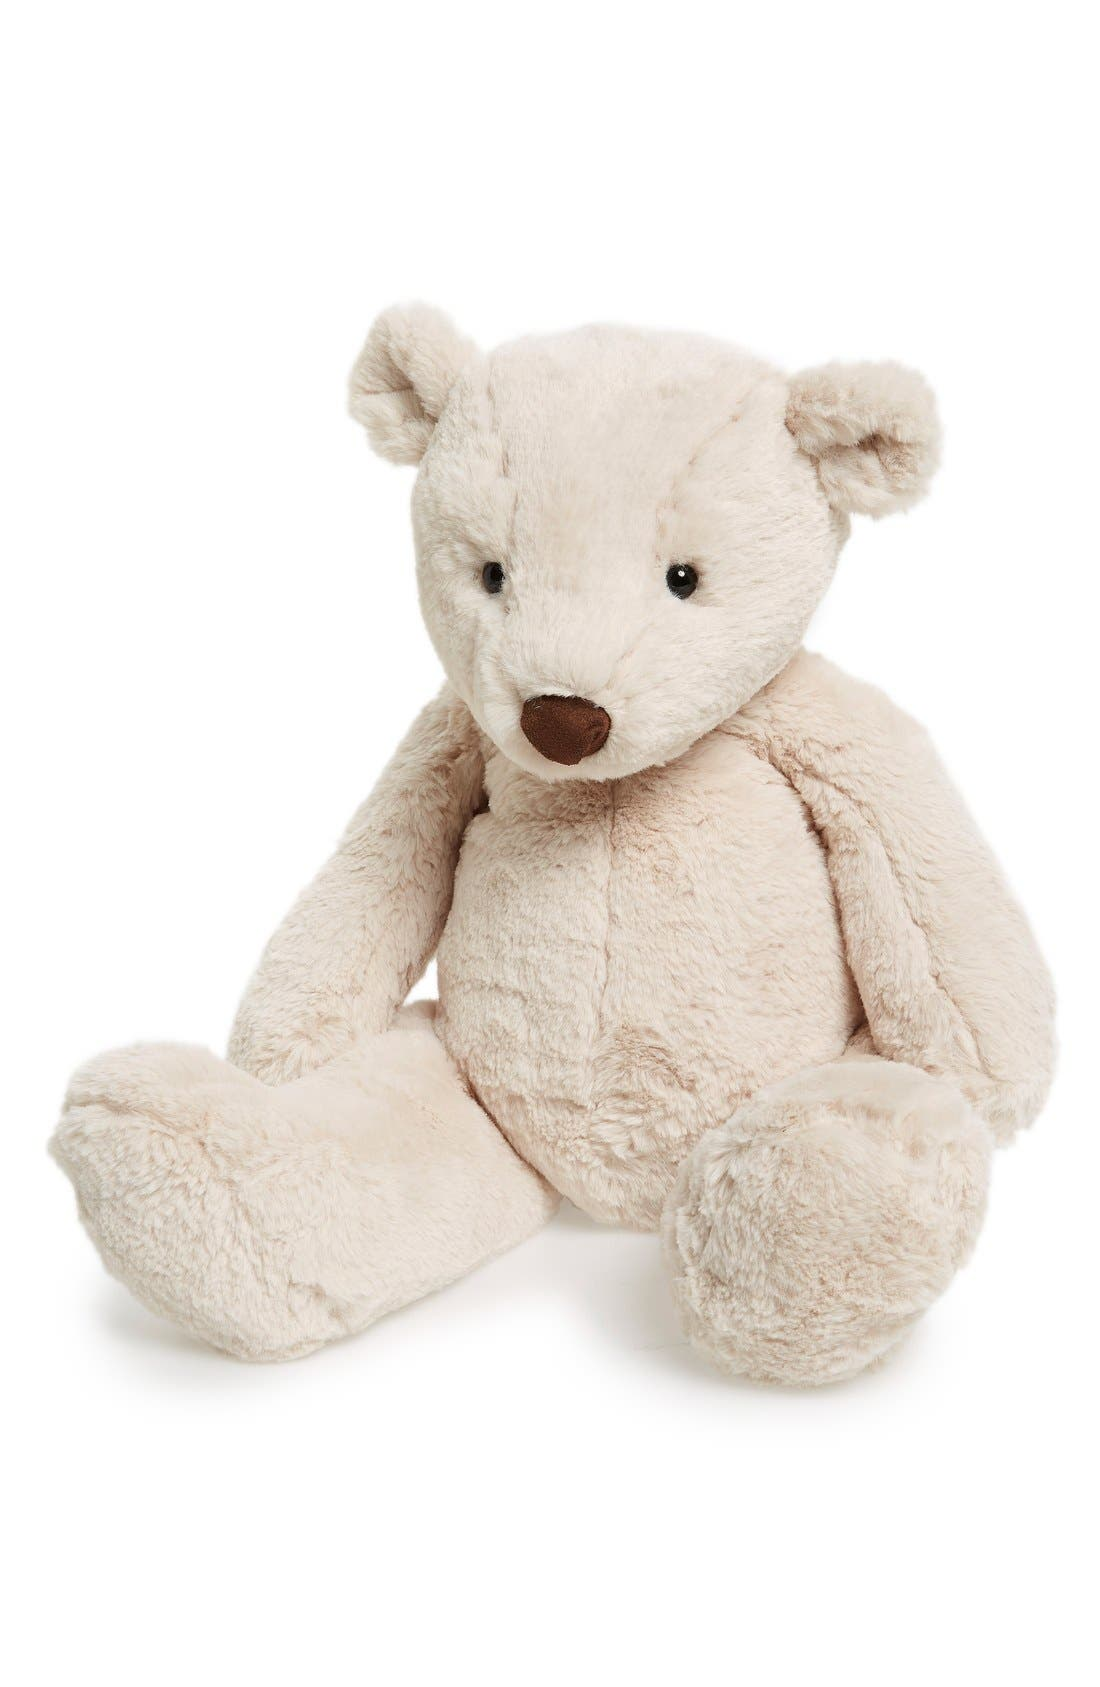 'Huge Barley Bear' Stuffed Animal,                             Alternate thumbnail 2, color,                             Ivory